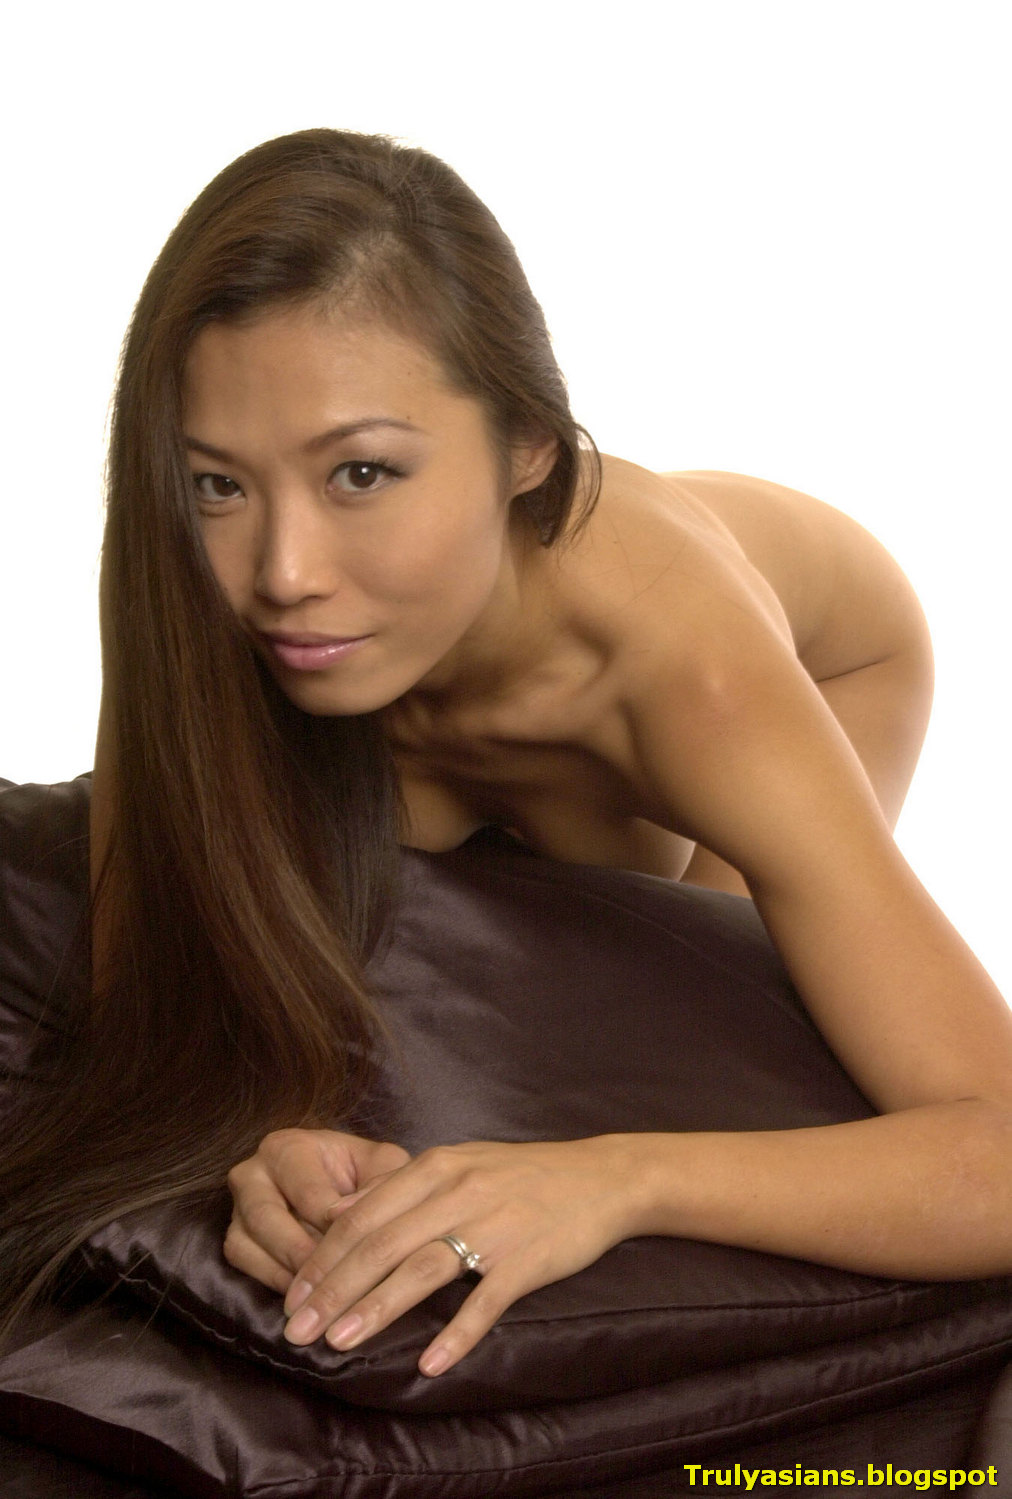 Asian model Yuki Nude Photo Shoot C (63 pics) - Beautyfull ...